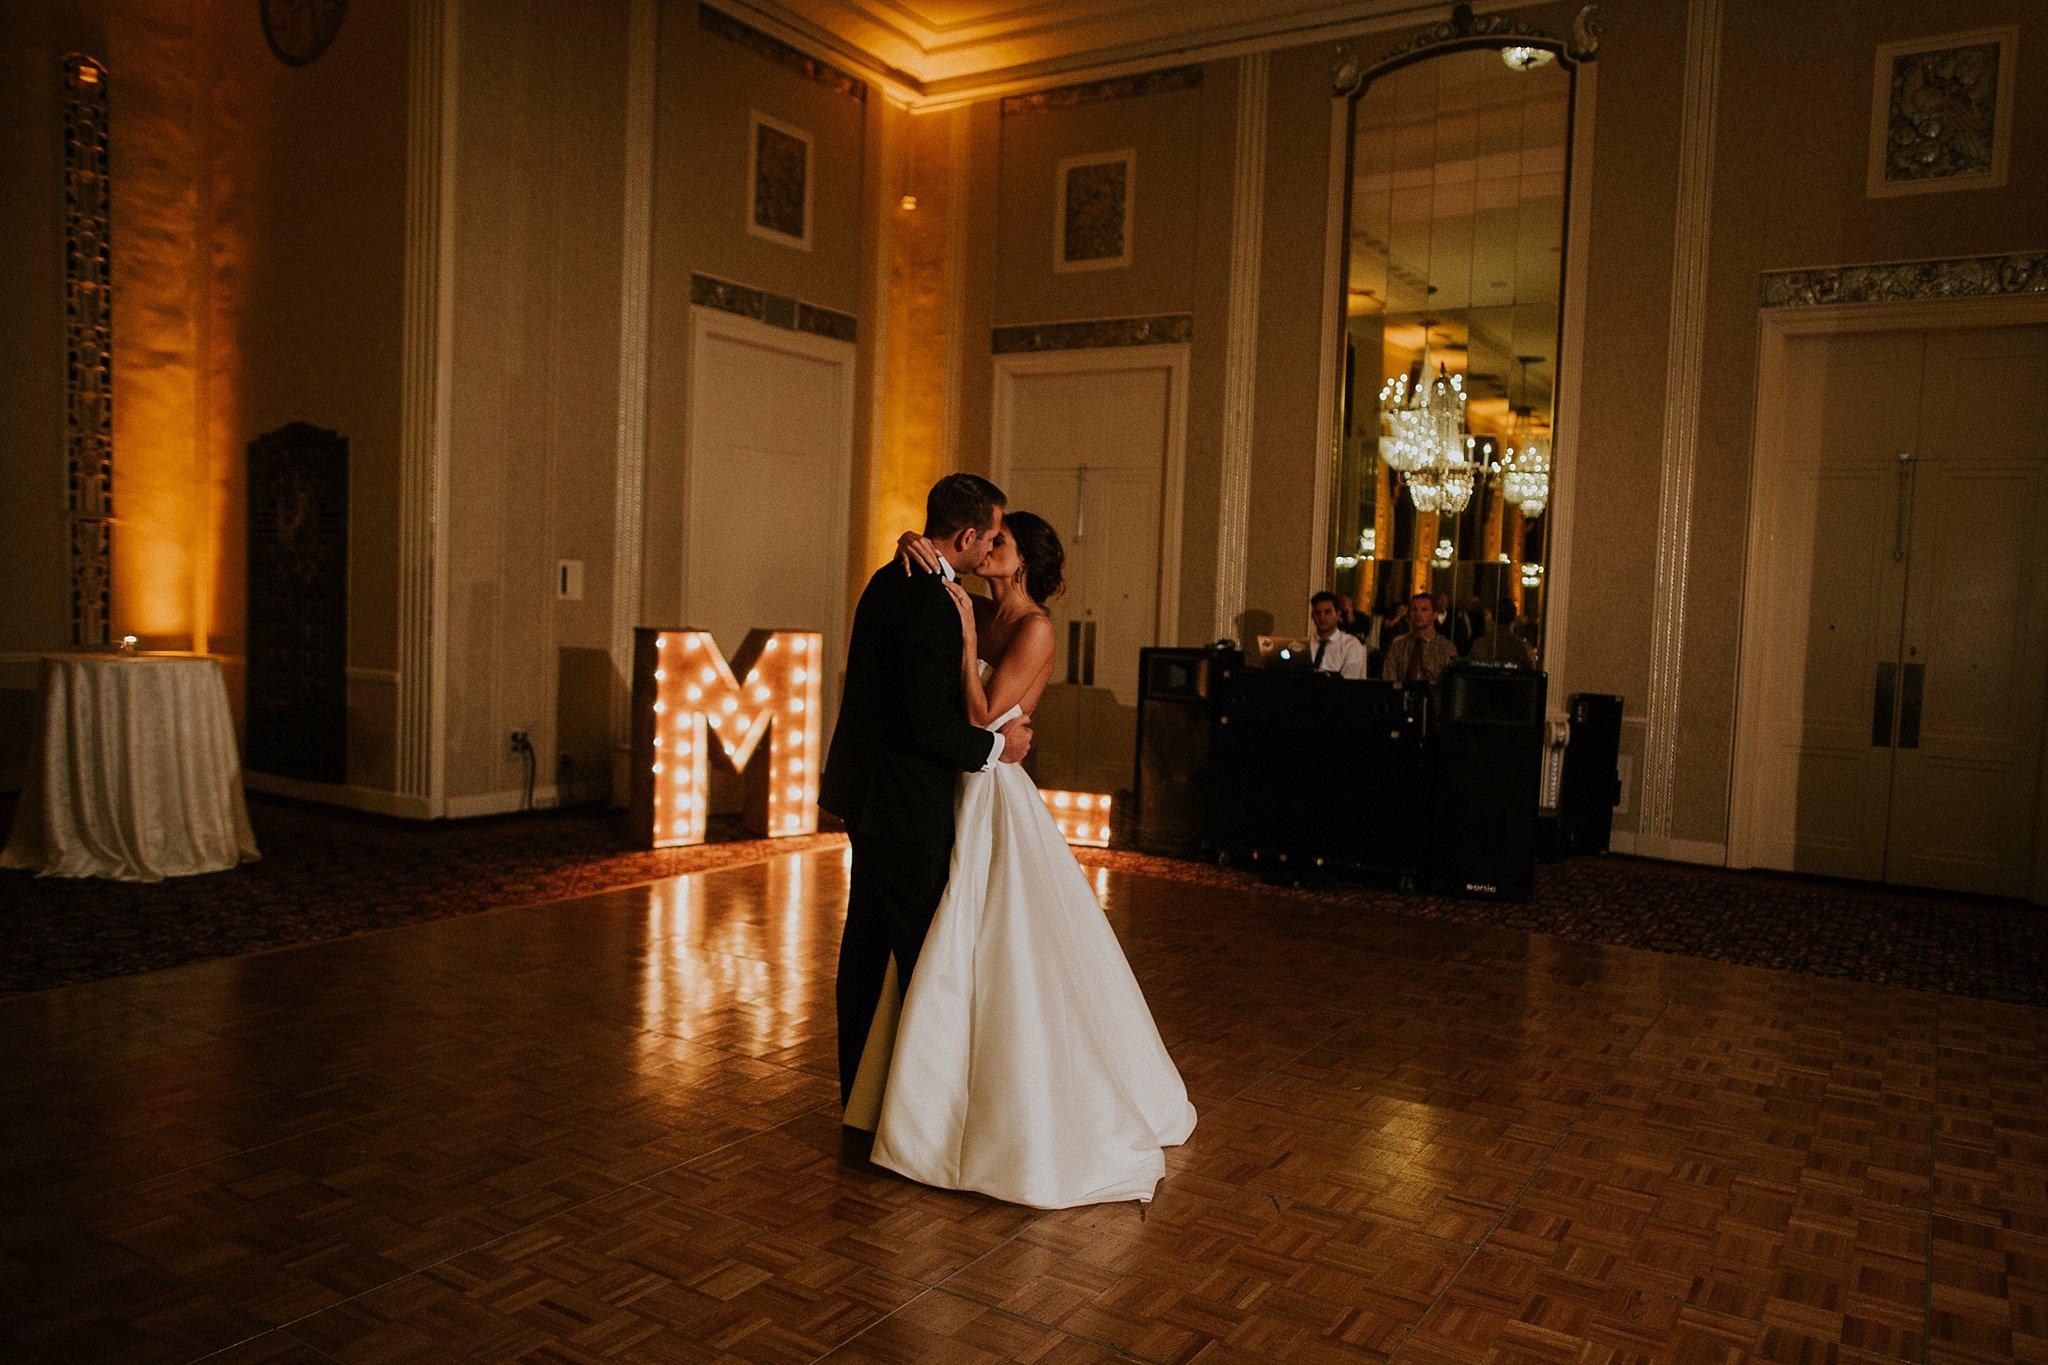 Matt-Lauren_St-Marys_Hilton-City-Center-Milwaukee-Wedding_liller-photo_0086.jpg